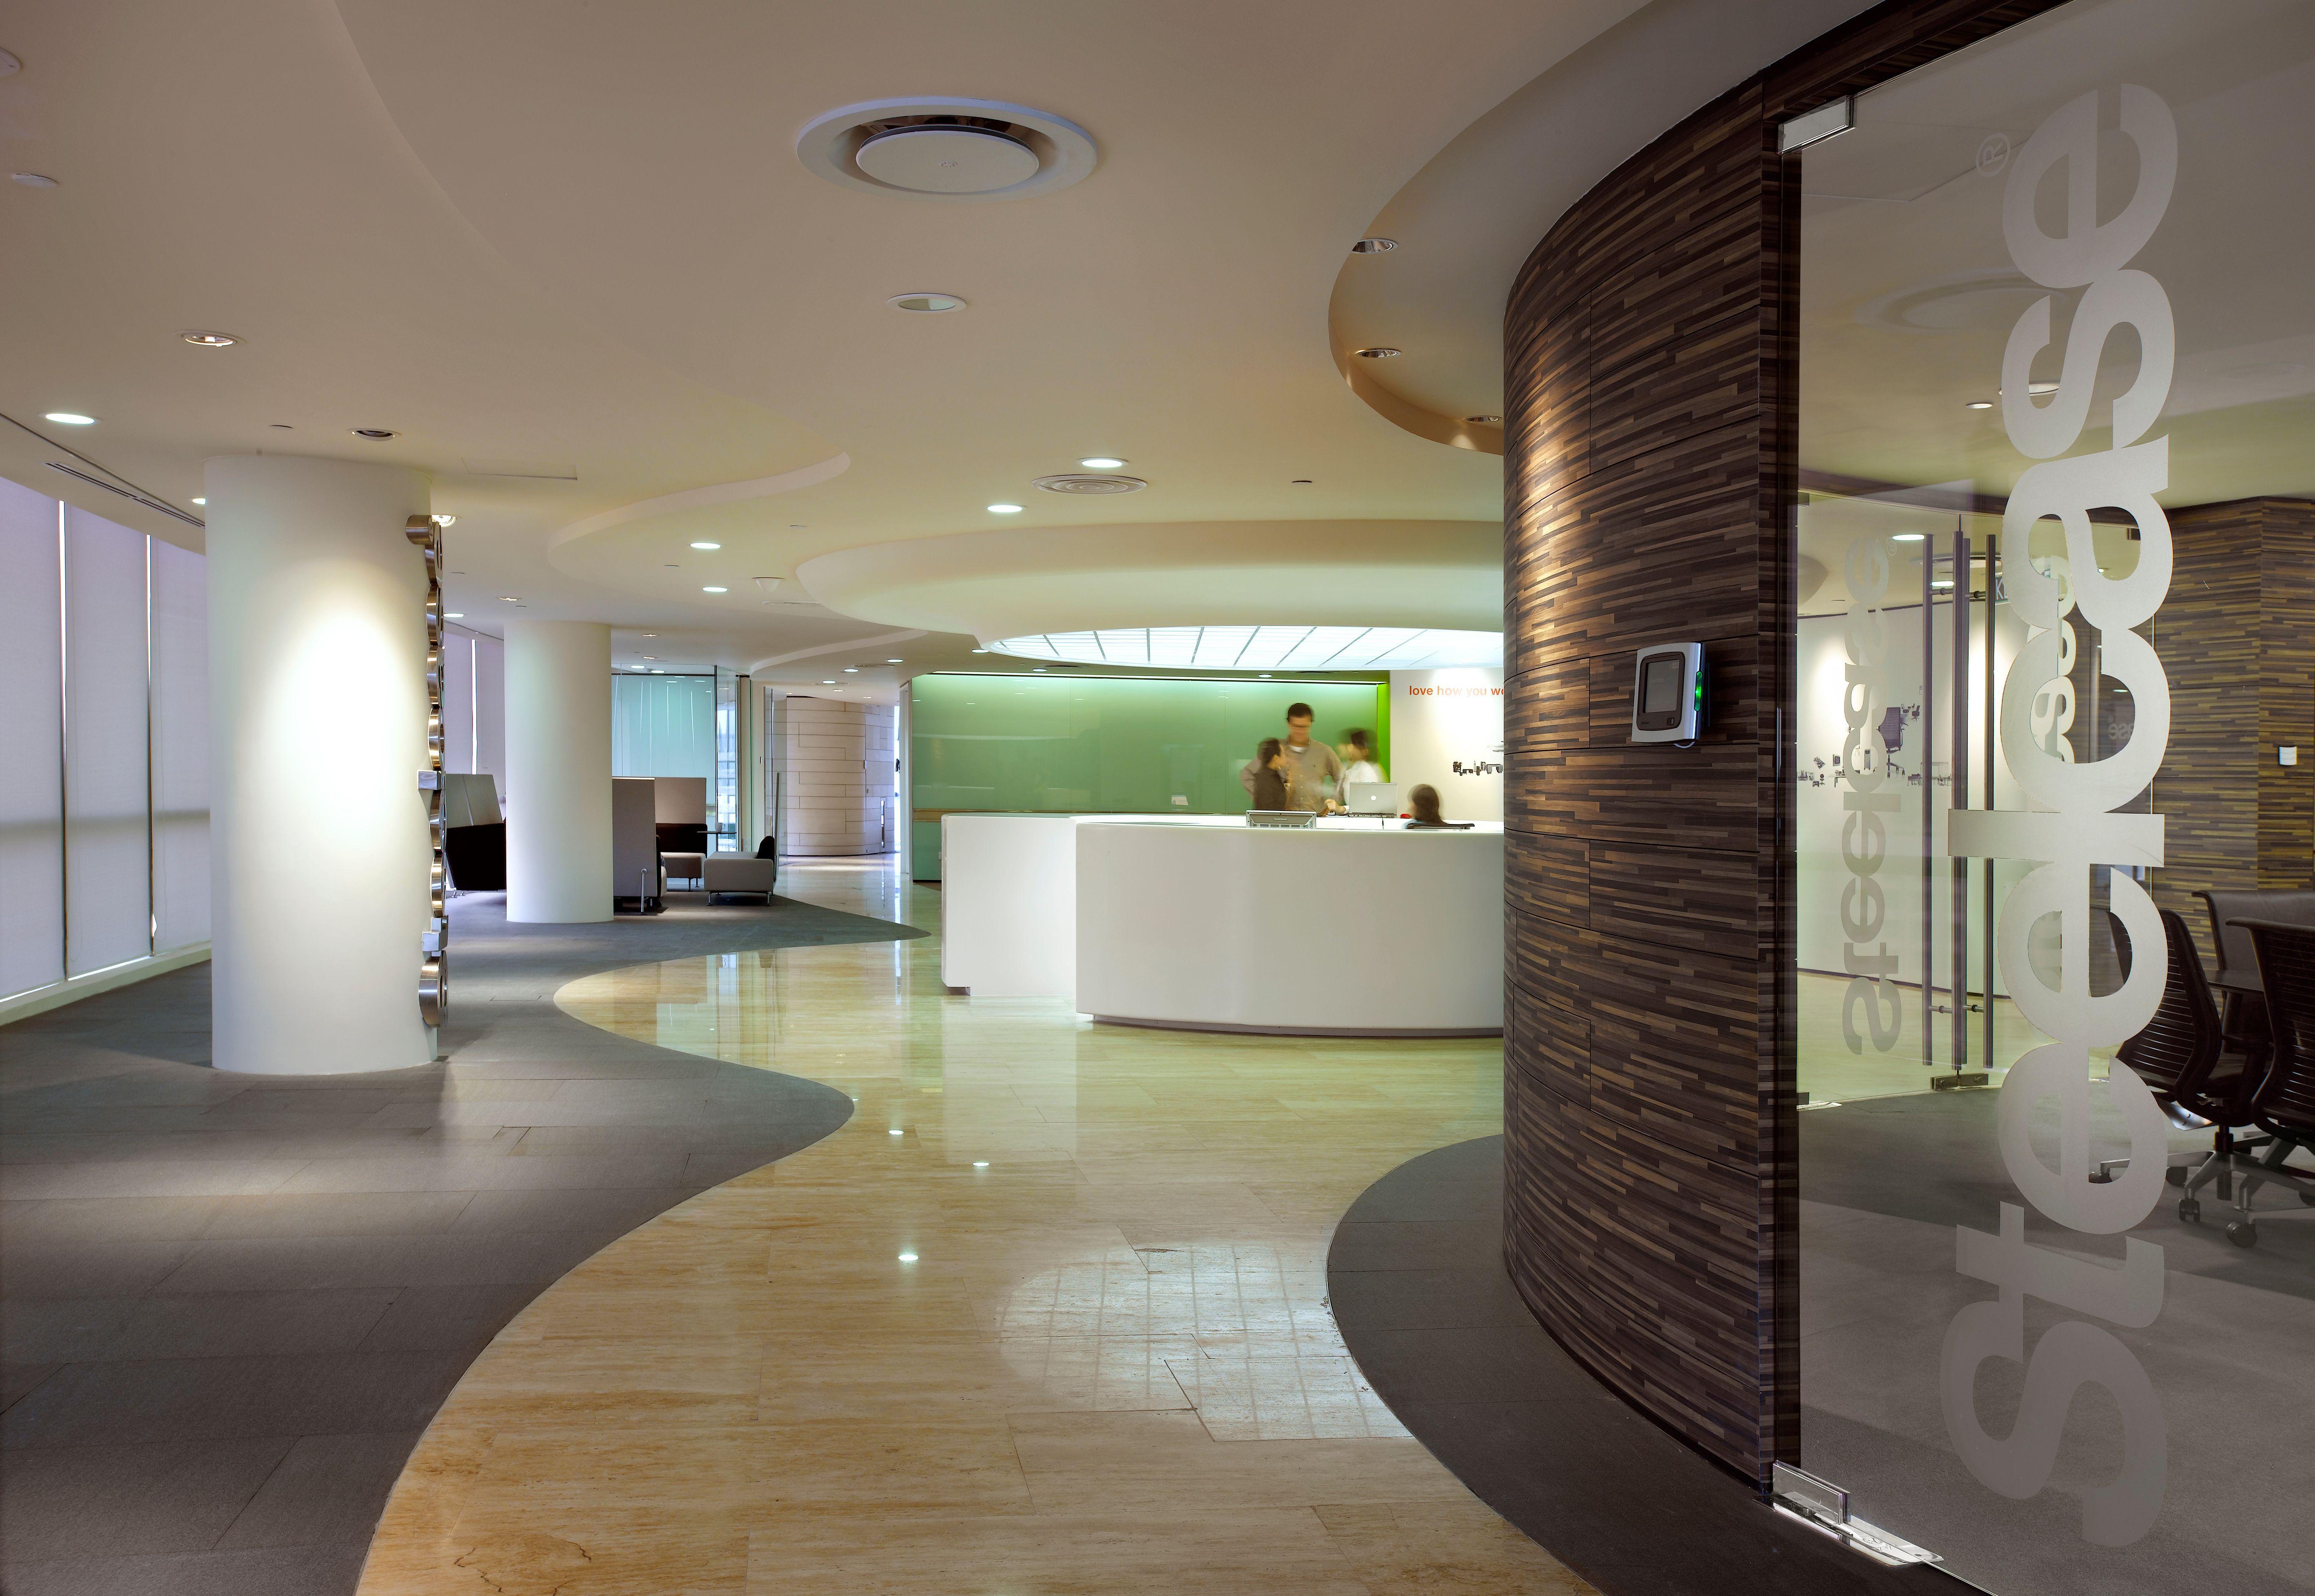 Steel Case Global Shared Offices In Kuala Lumpur Malaysia